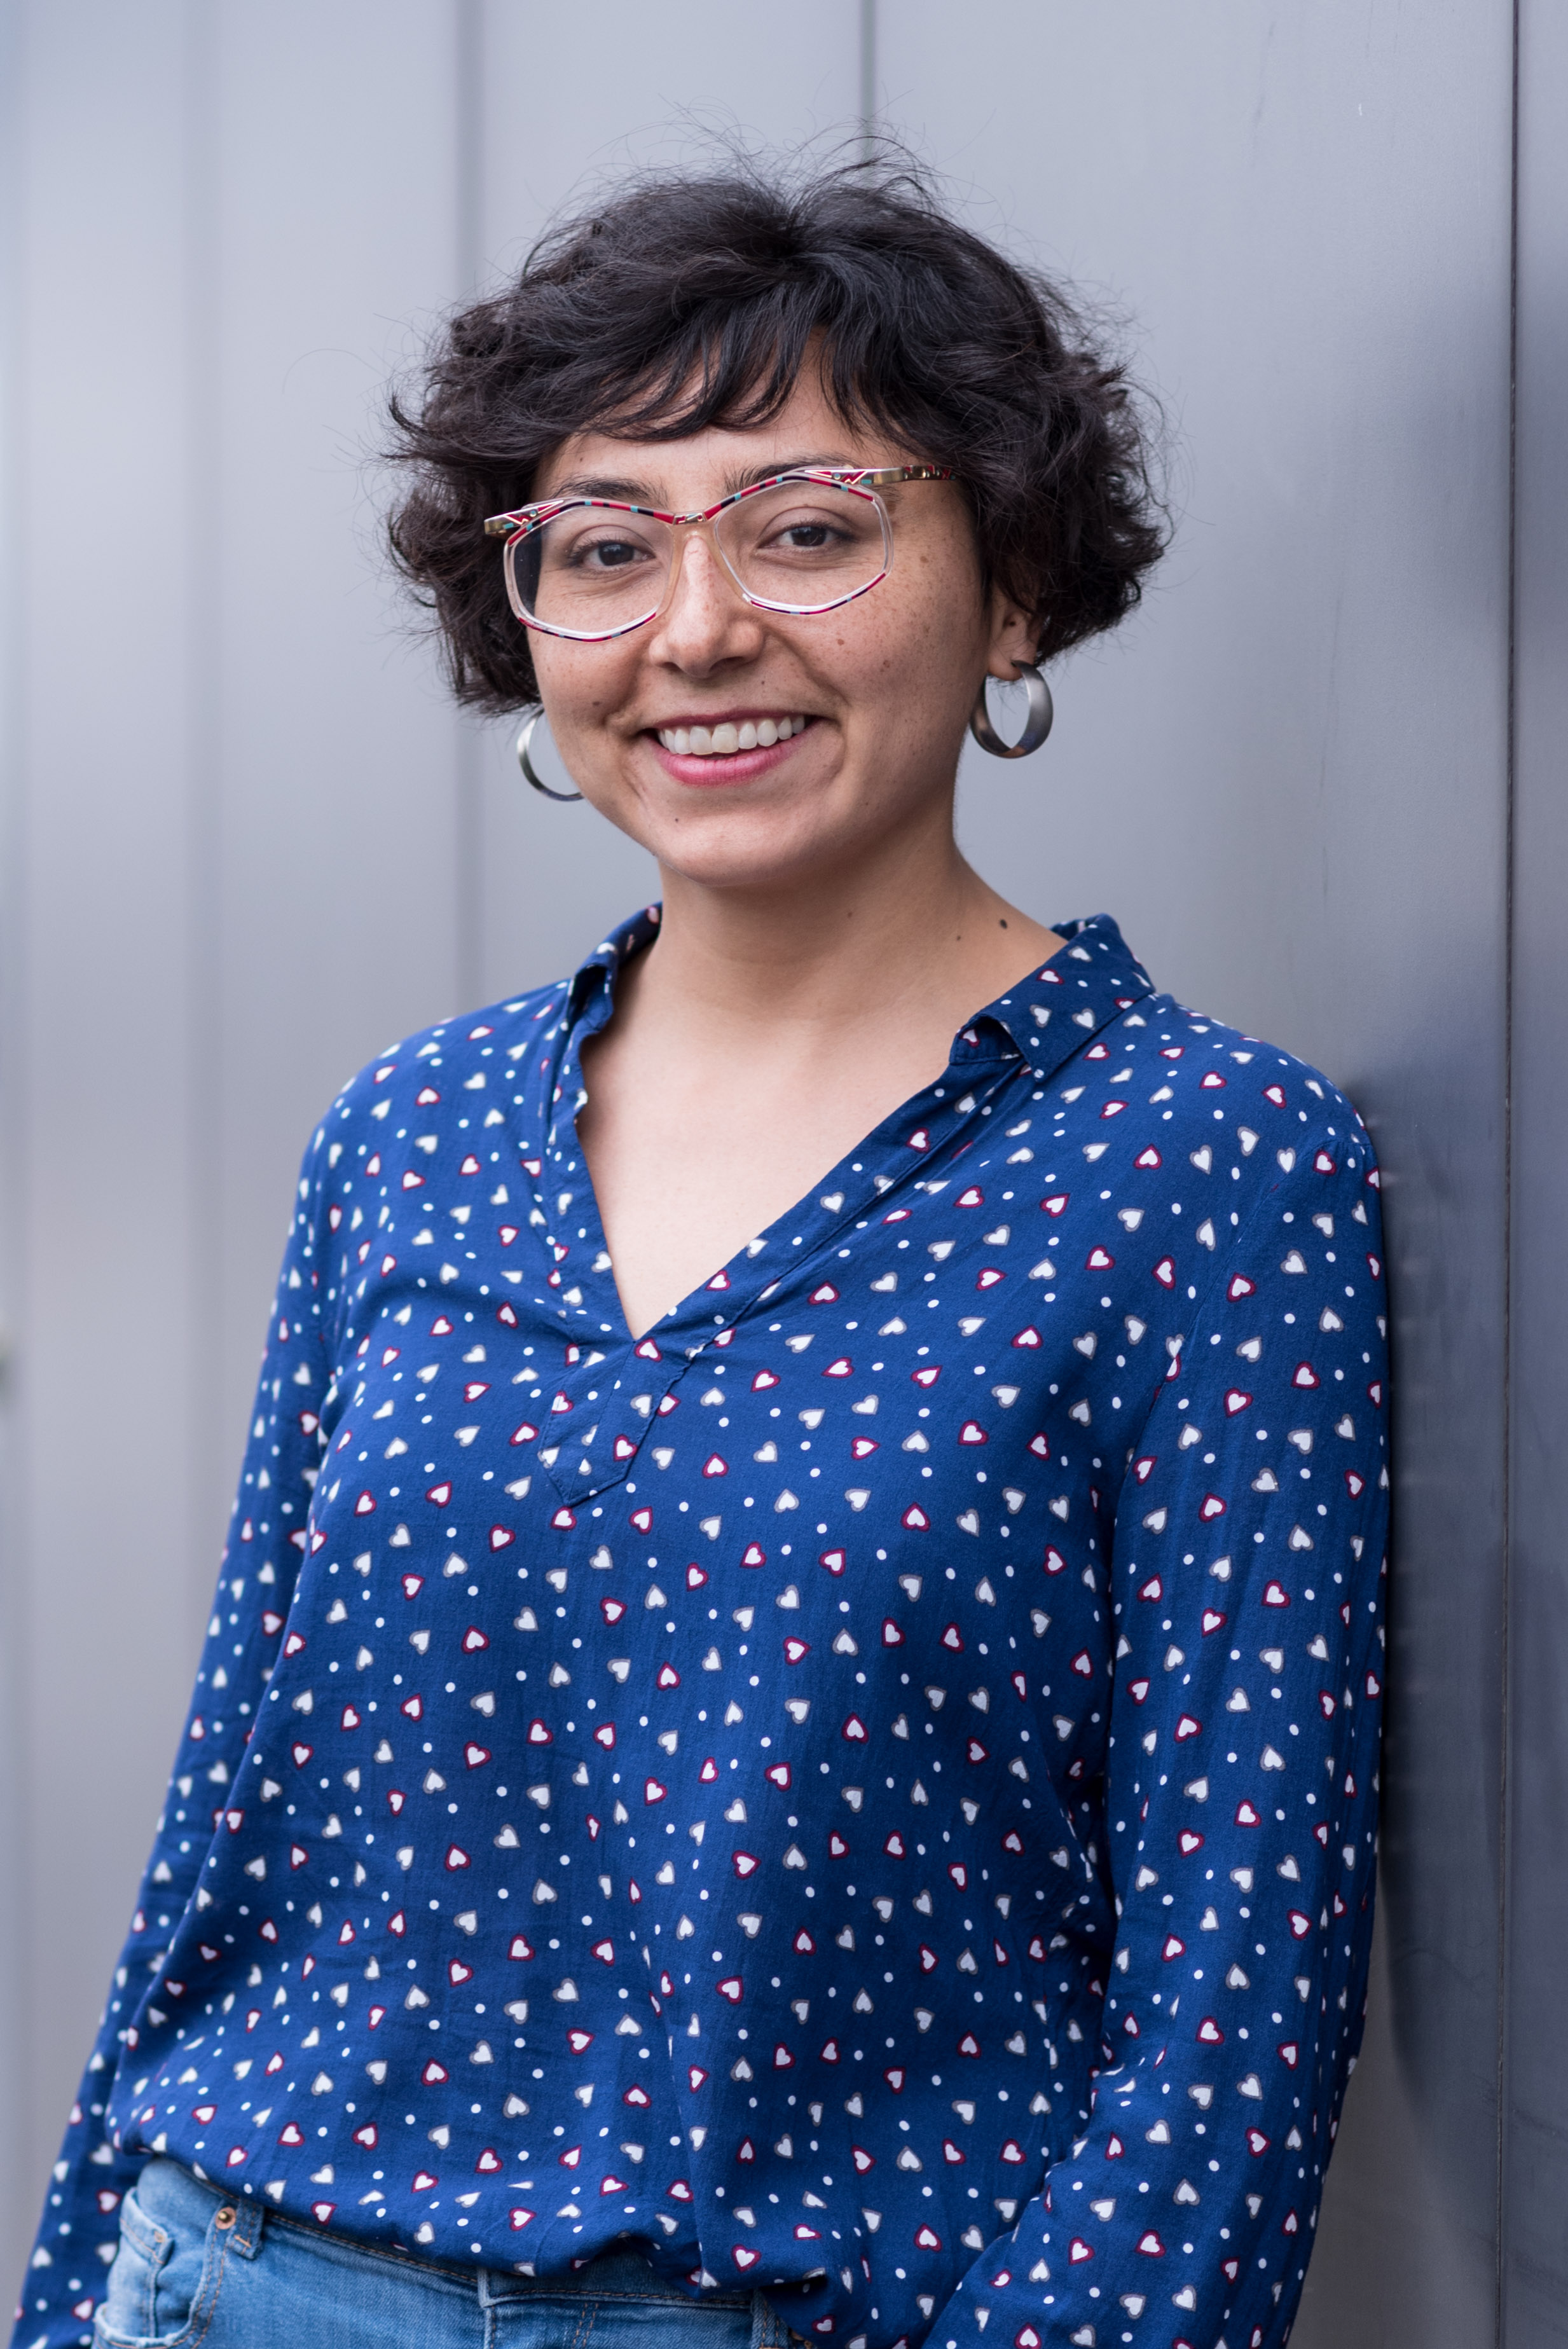 Anita Peña Saavedra - 20178-19 Atlantic Fellow for Social and Economic Equity